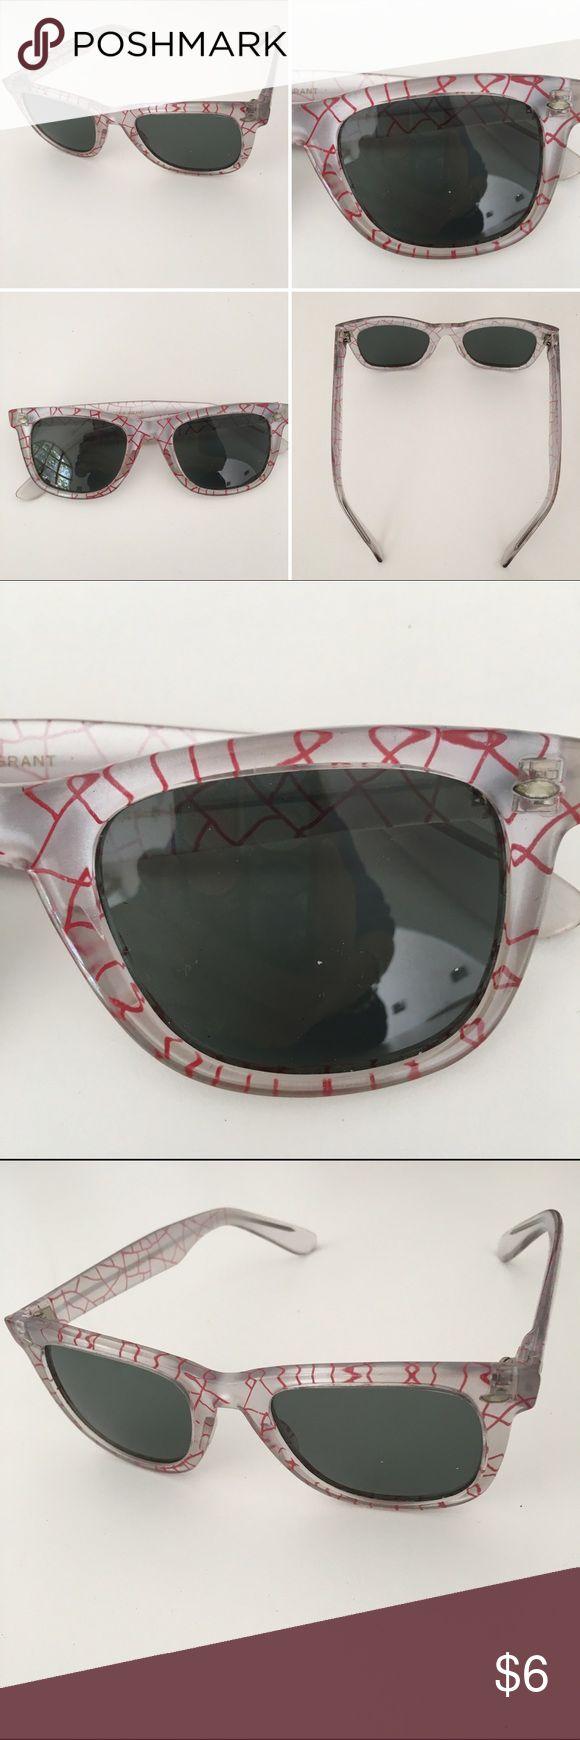 FOSTER GRANT sunglasses, gray glass, trendy design Color: Transparent frosty & red design --Gray glass --Super price 😎 Foster Grant Accessories Sunglasses